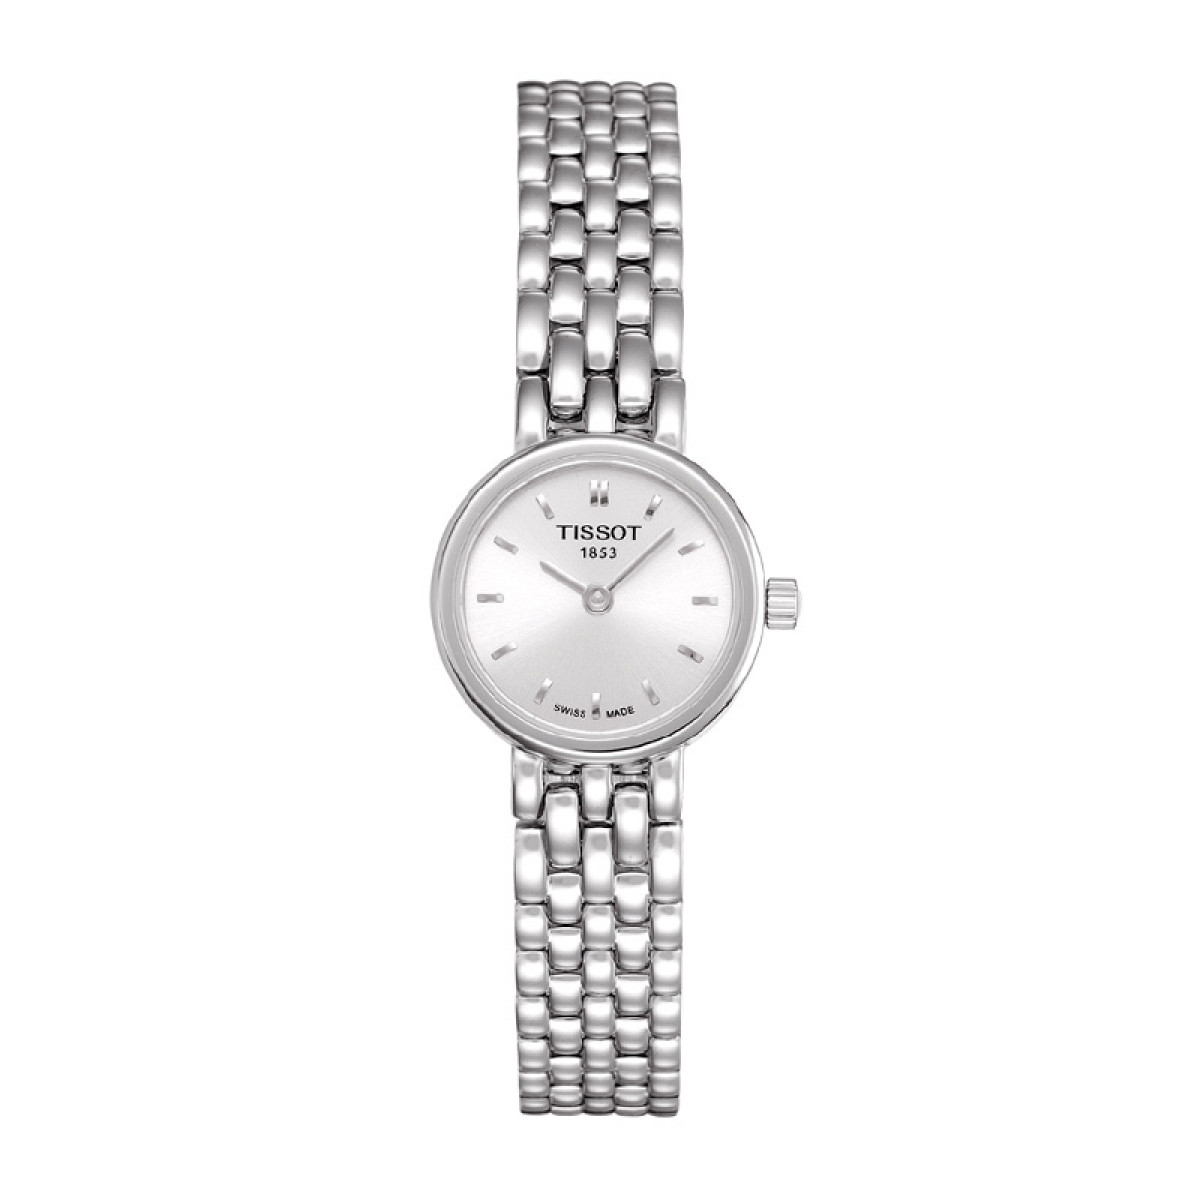 Часовник Tissot T058.009.11.031.00